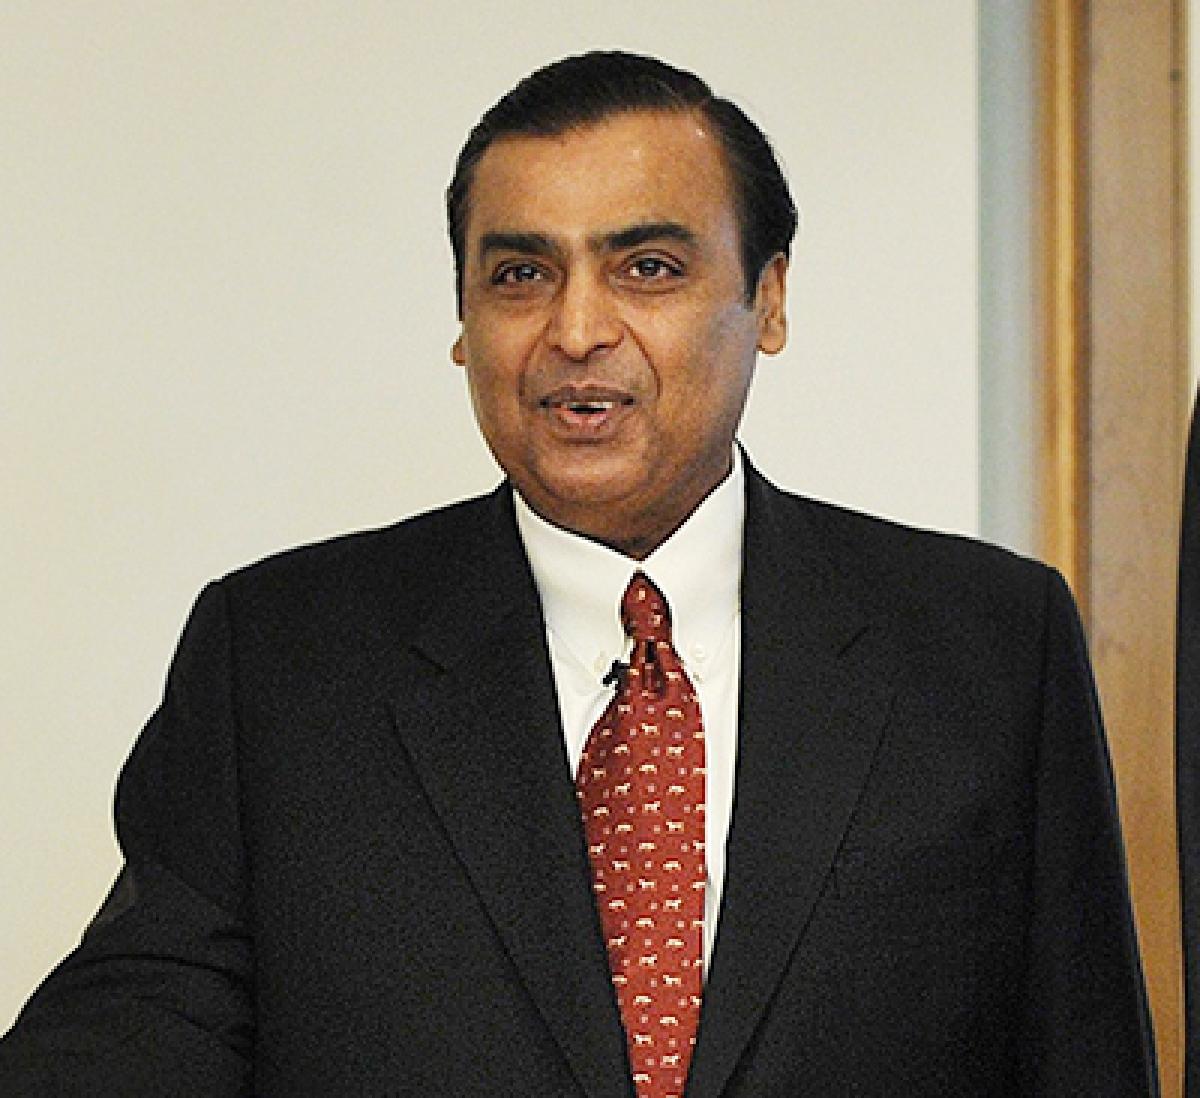 Mukesh Ambani still richest Indian in average year for billionaires: Hurun Report